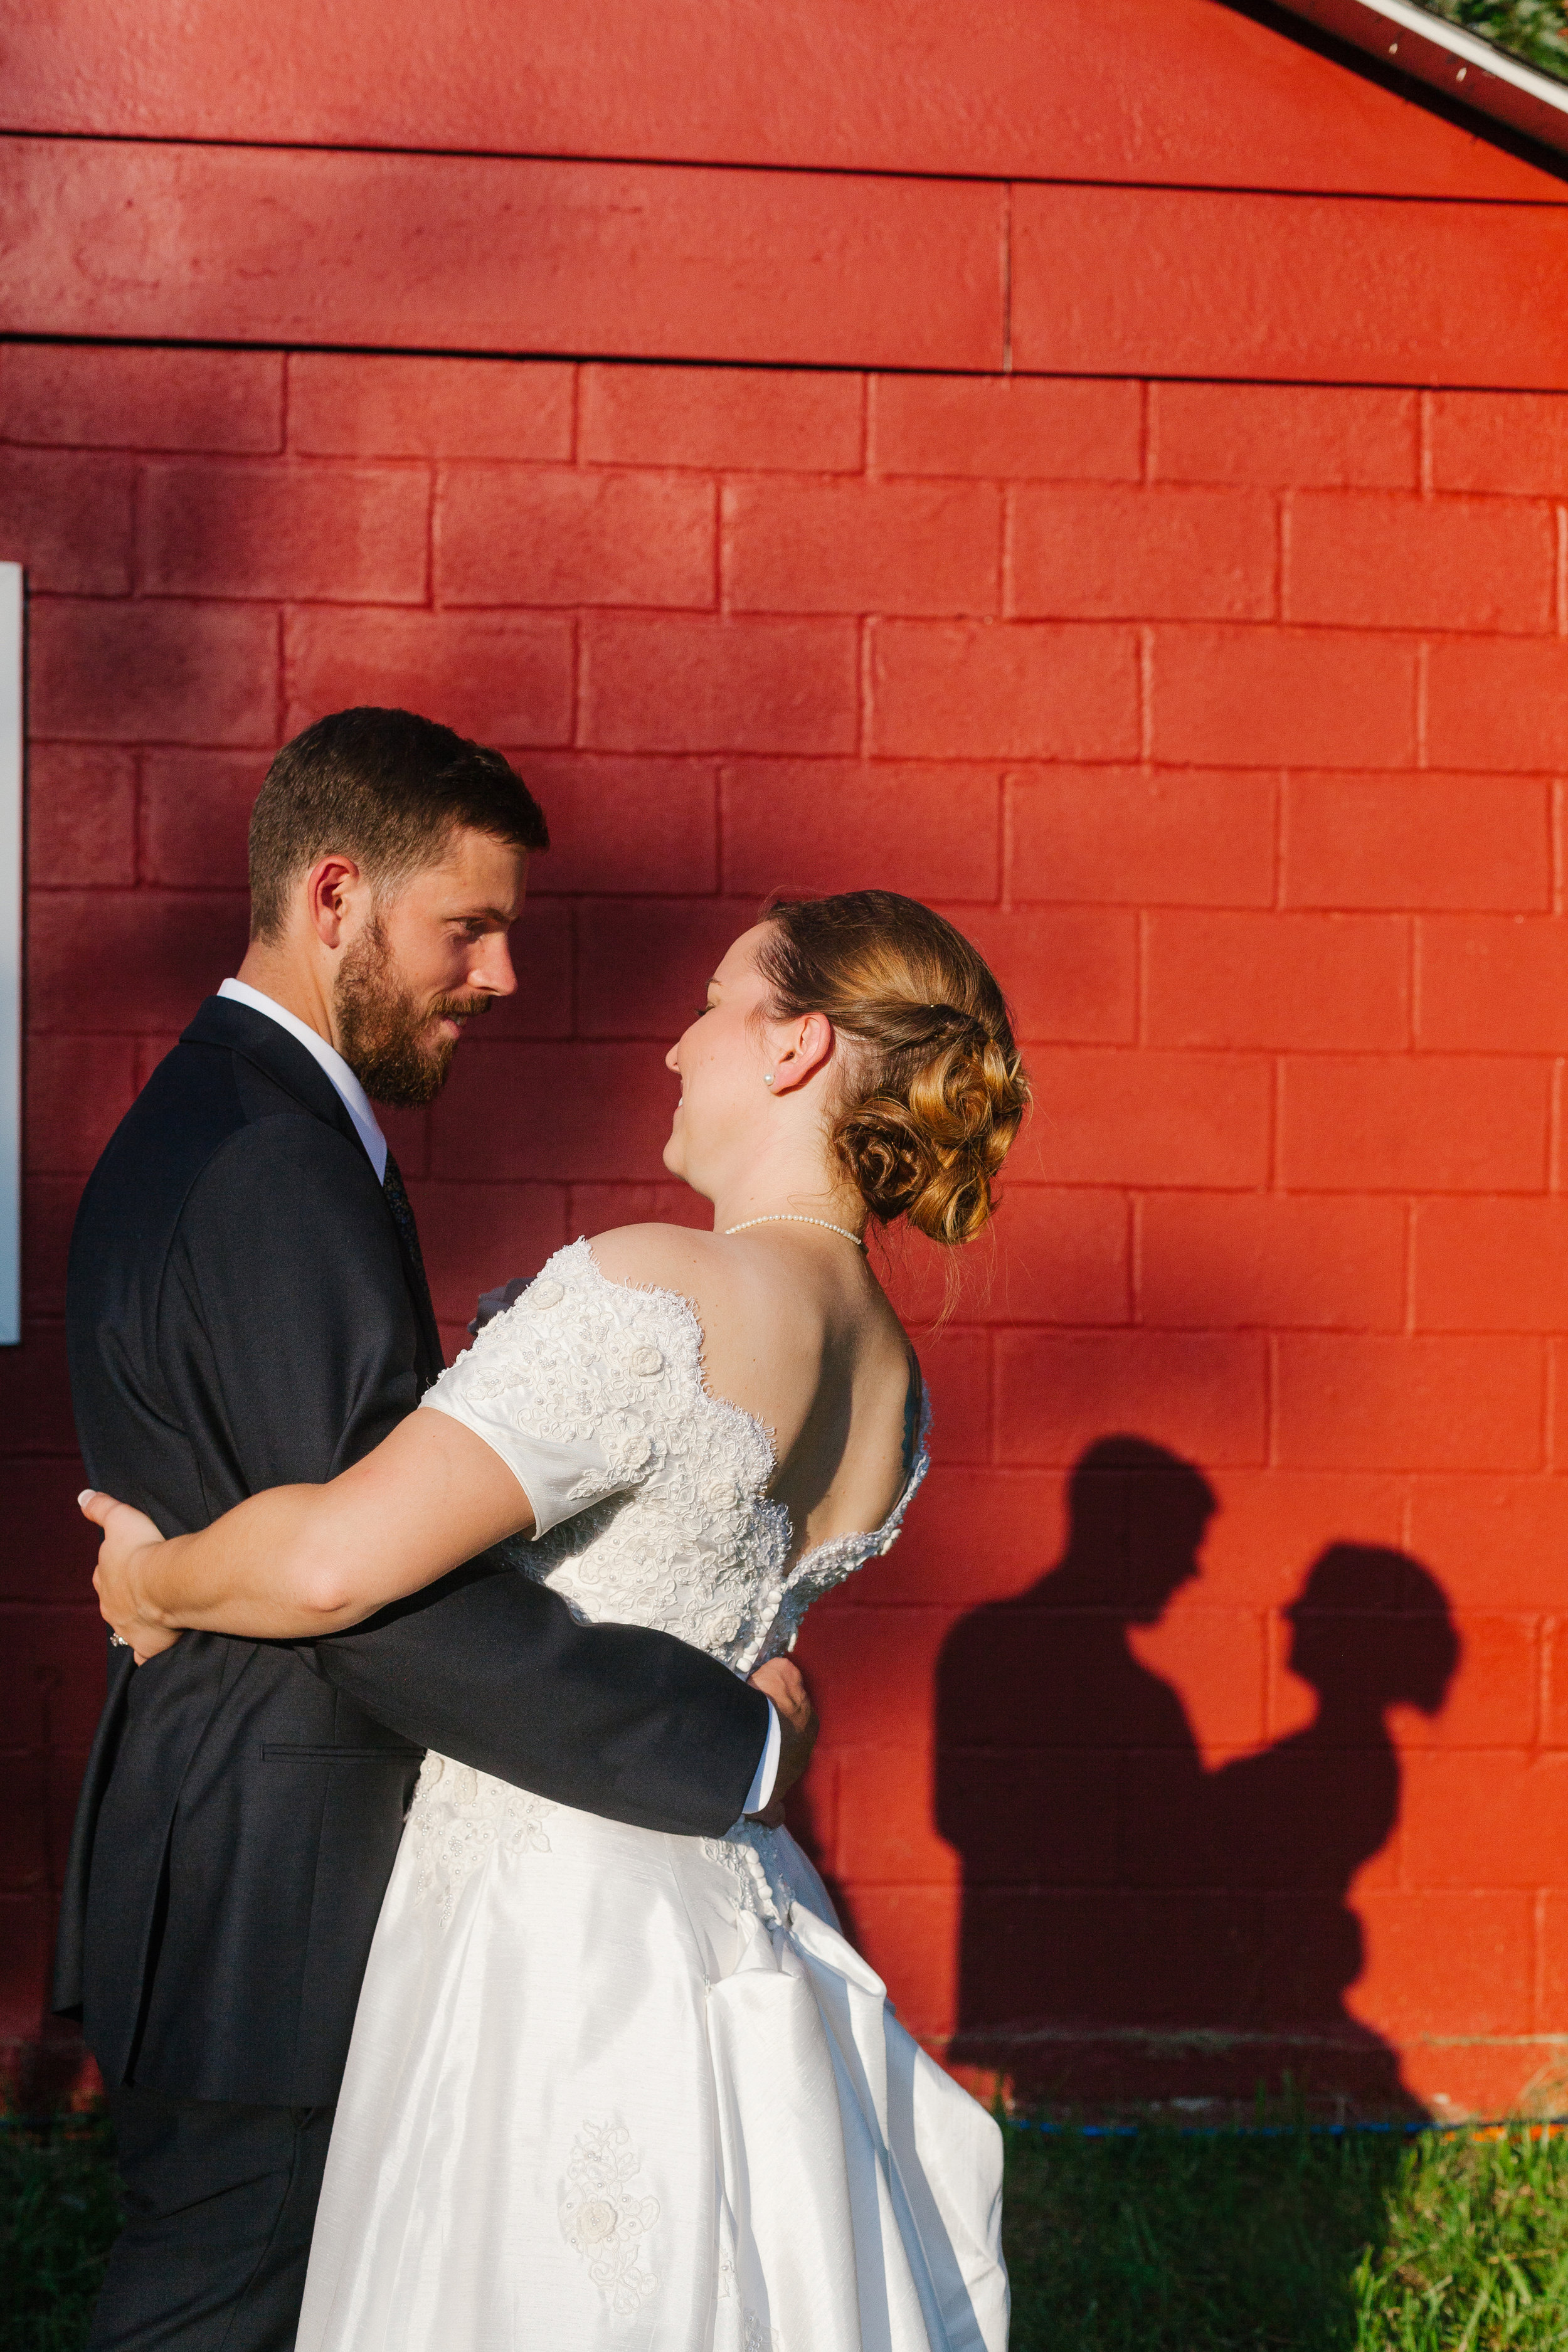 Heather&Tom-CalandraWedding_266.jpg